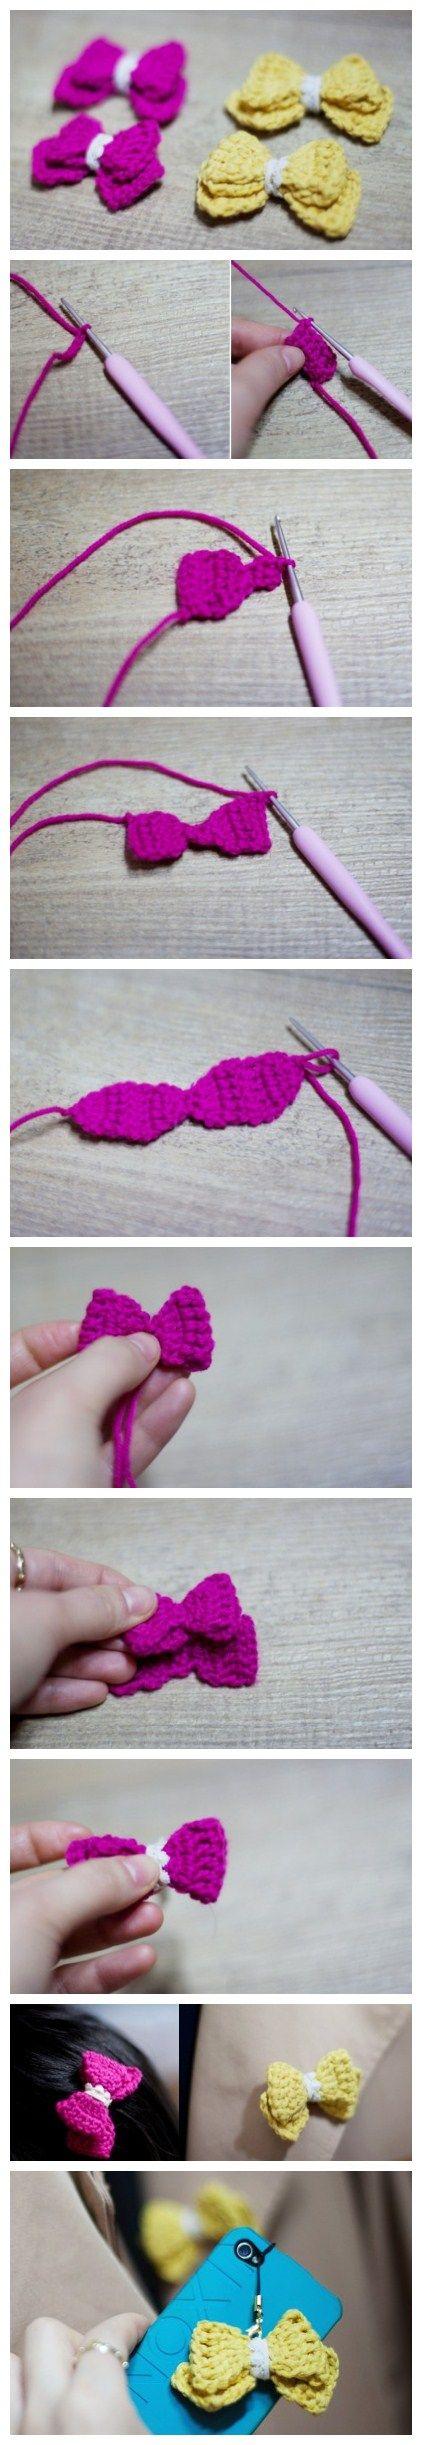 http://agulhaspinceisemais.blogspot.com.br/2011/09/lacinhos-de-croche.html .. http://crochetit.blogspot.ca/2009/12/free-spring-butterflies-crochet-pattern.html .. http://adaiha.blogspot.ca/2011/02/super-simple-crochet-bows.html .. http://www.craftinessisnotoptional.com/2013/01/easy-crochet-bow-tutorialpattern.html .. http://www.crochetspot.com/crochet-pattern-pretty-pretty-bow/ .. http://www.luulla.com/product/65671/pick-2-headbands-bow-headbands-pick-2-for-30-and-save